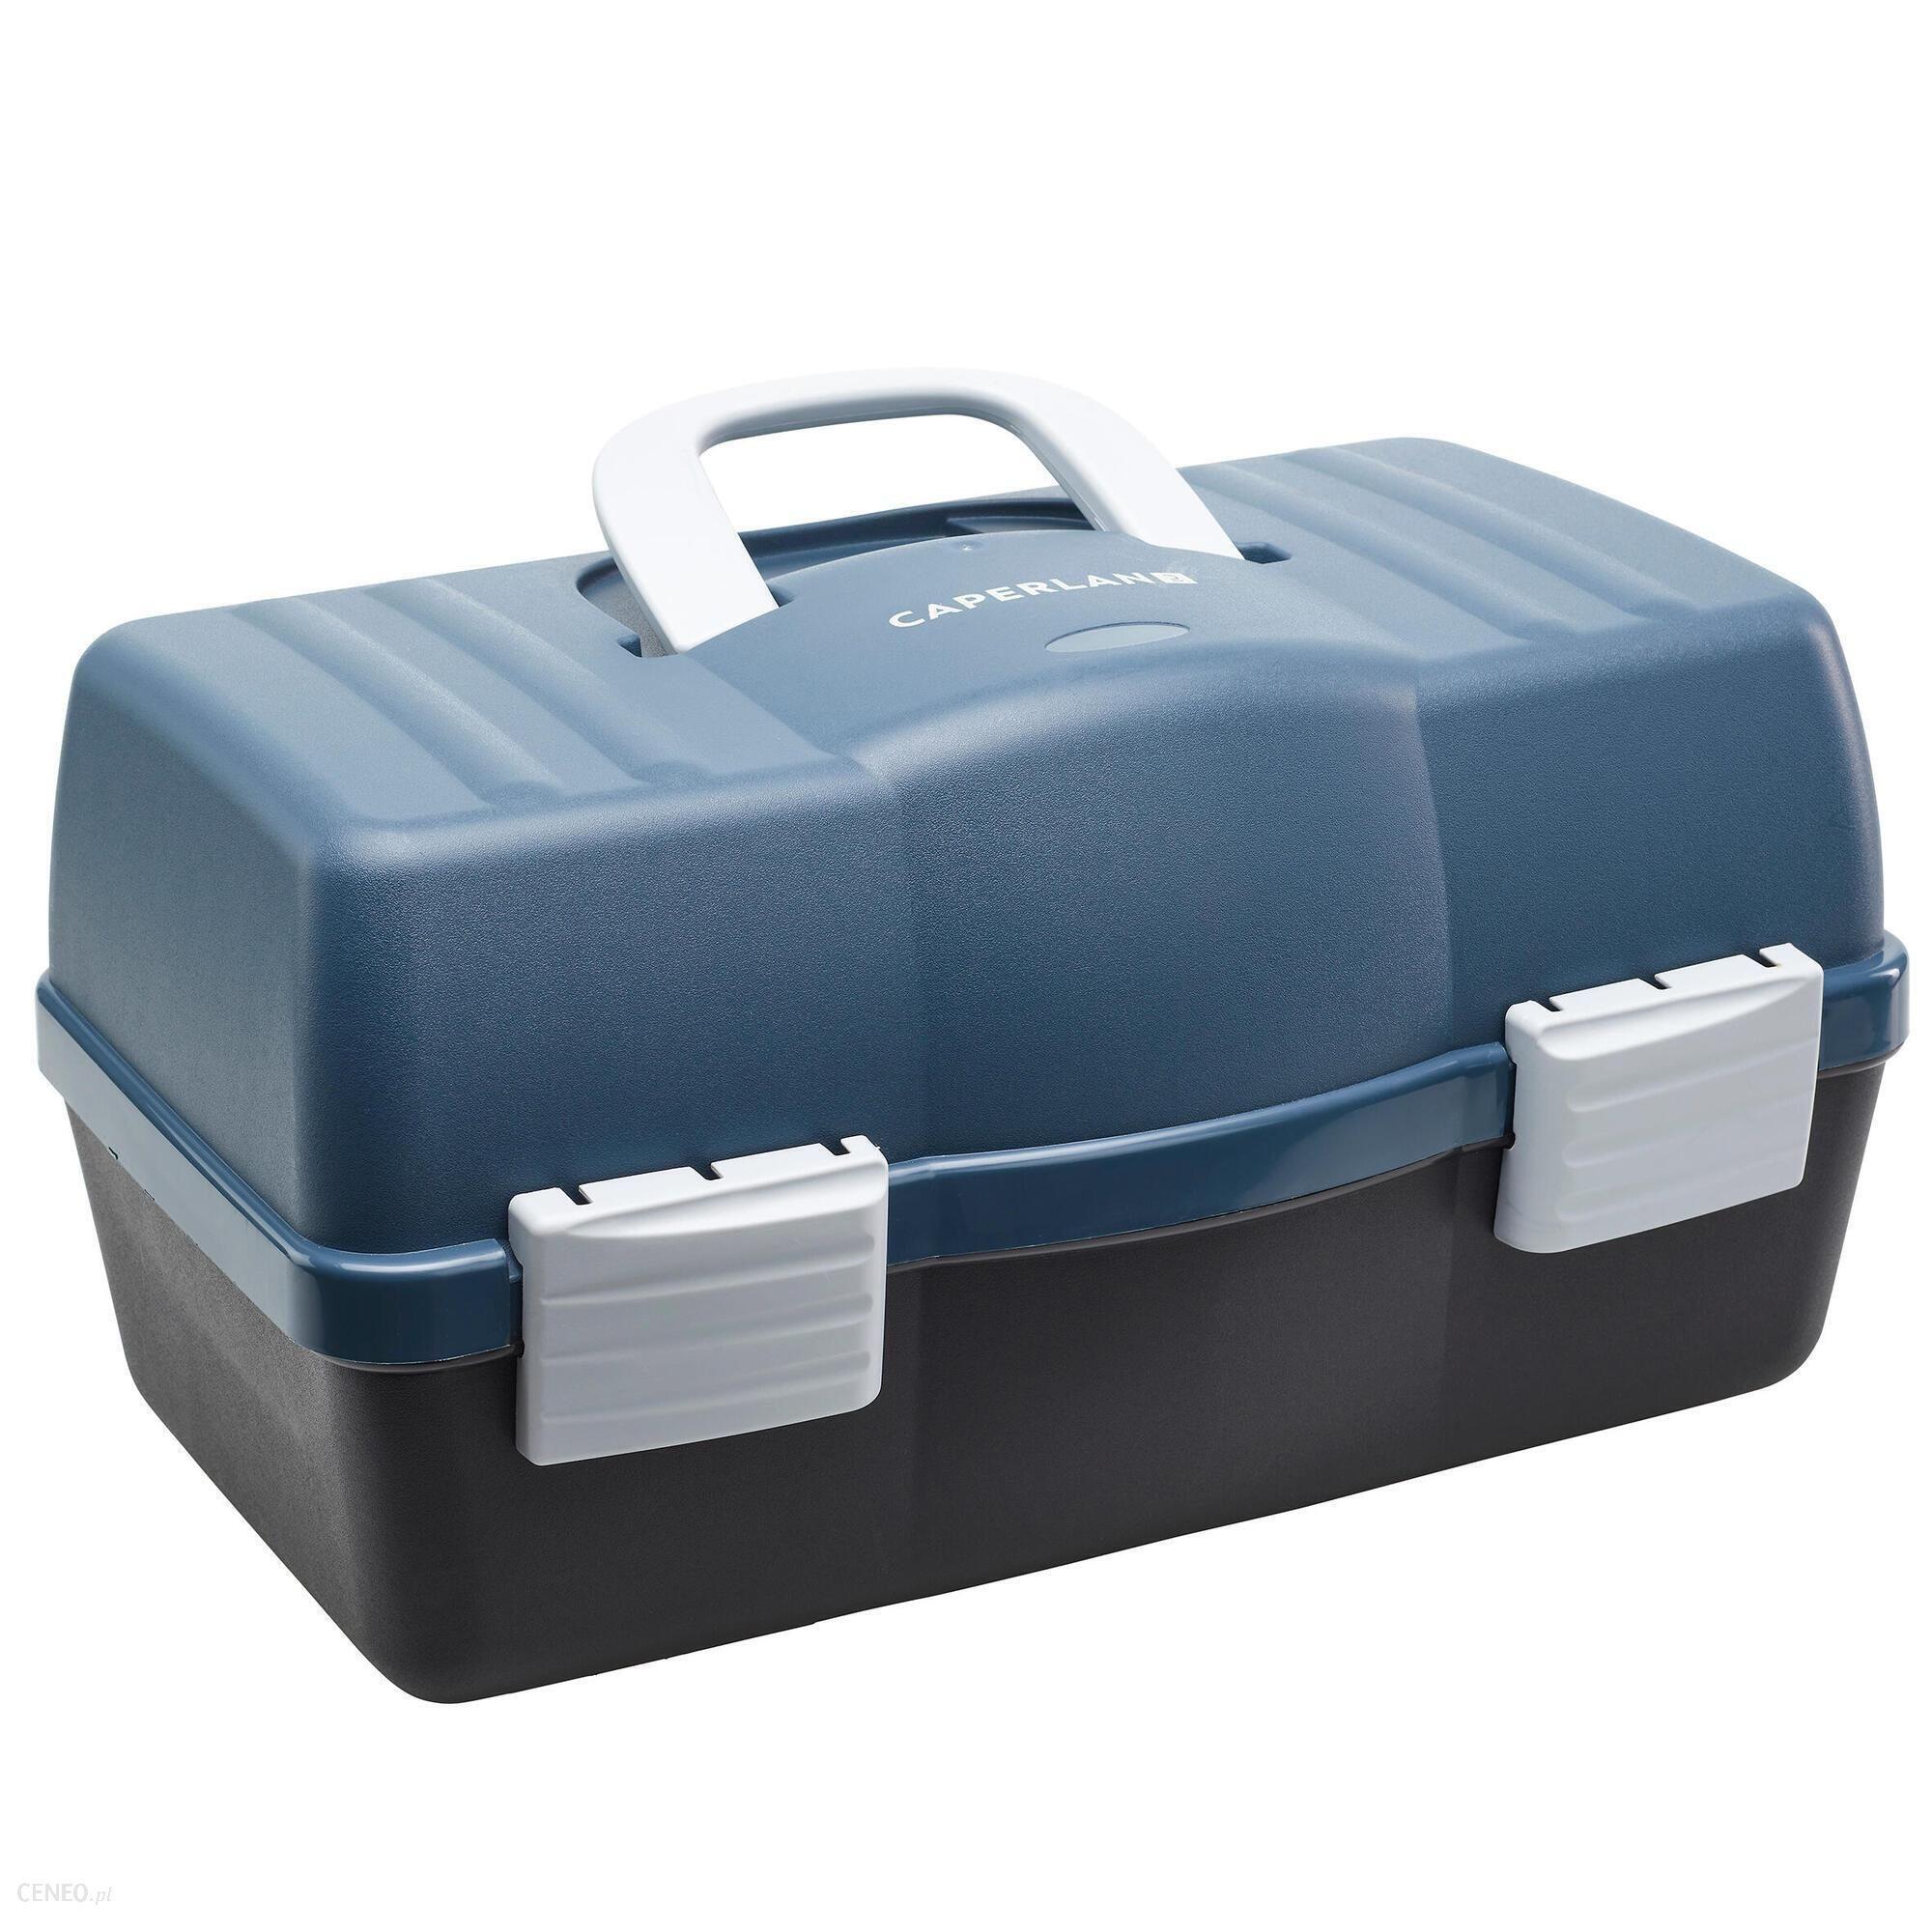 Caperlan Pudełko 6-Poziomowe Bx 6T 17